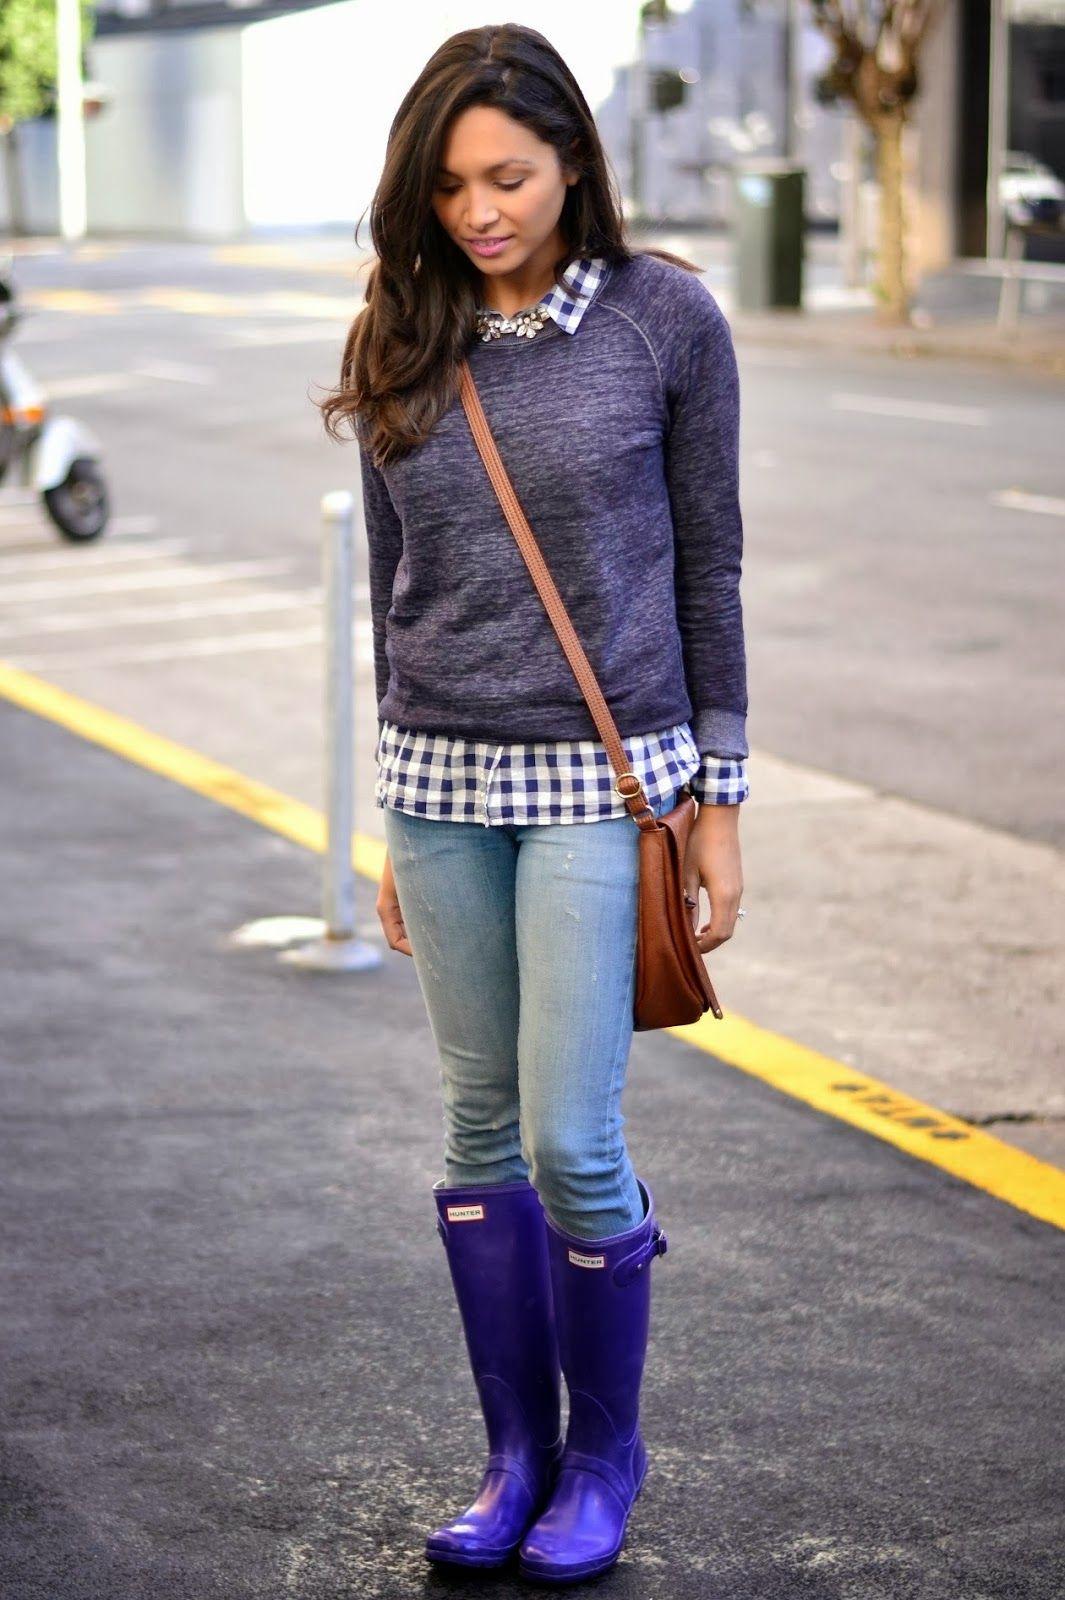 Britt of Britt + Whit wearing Hunter boots for a great purple on purple look